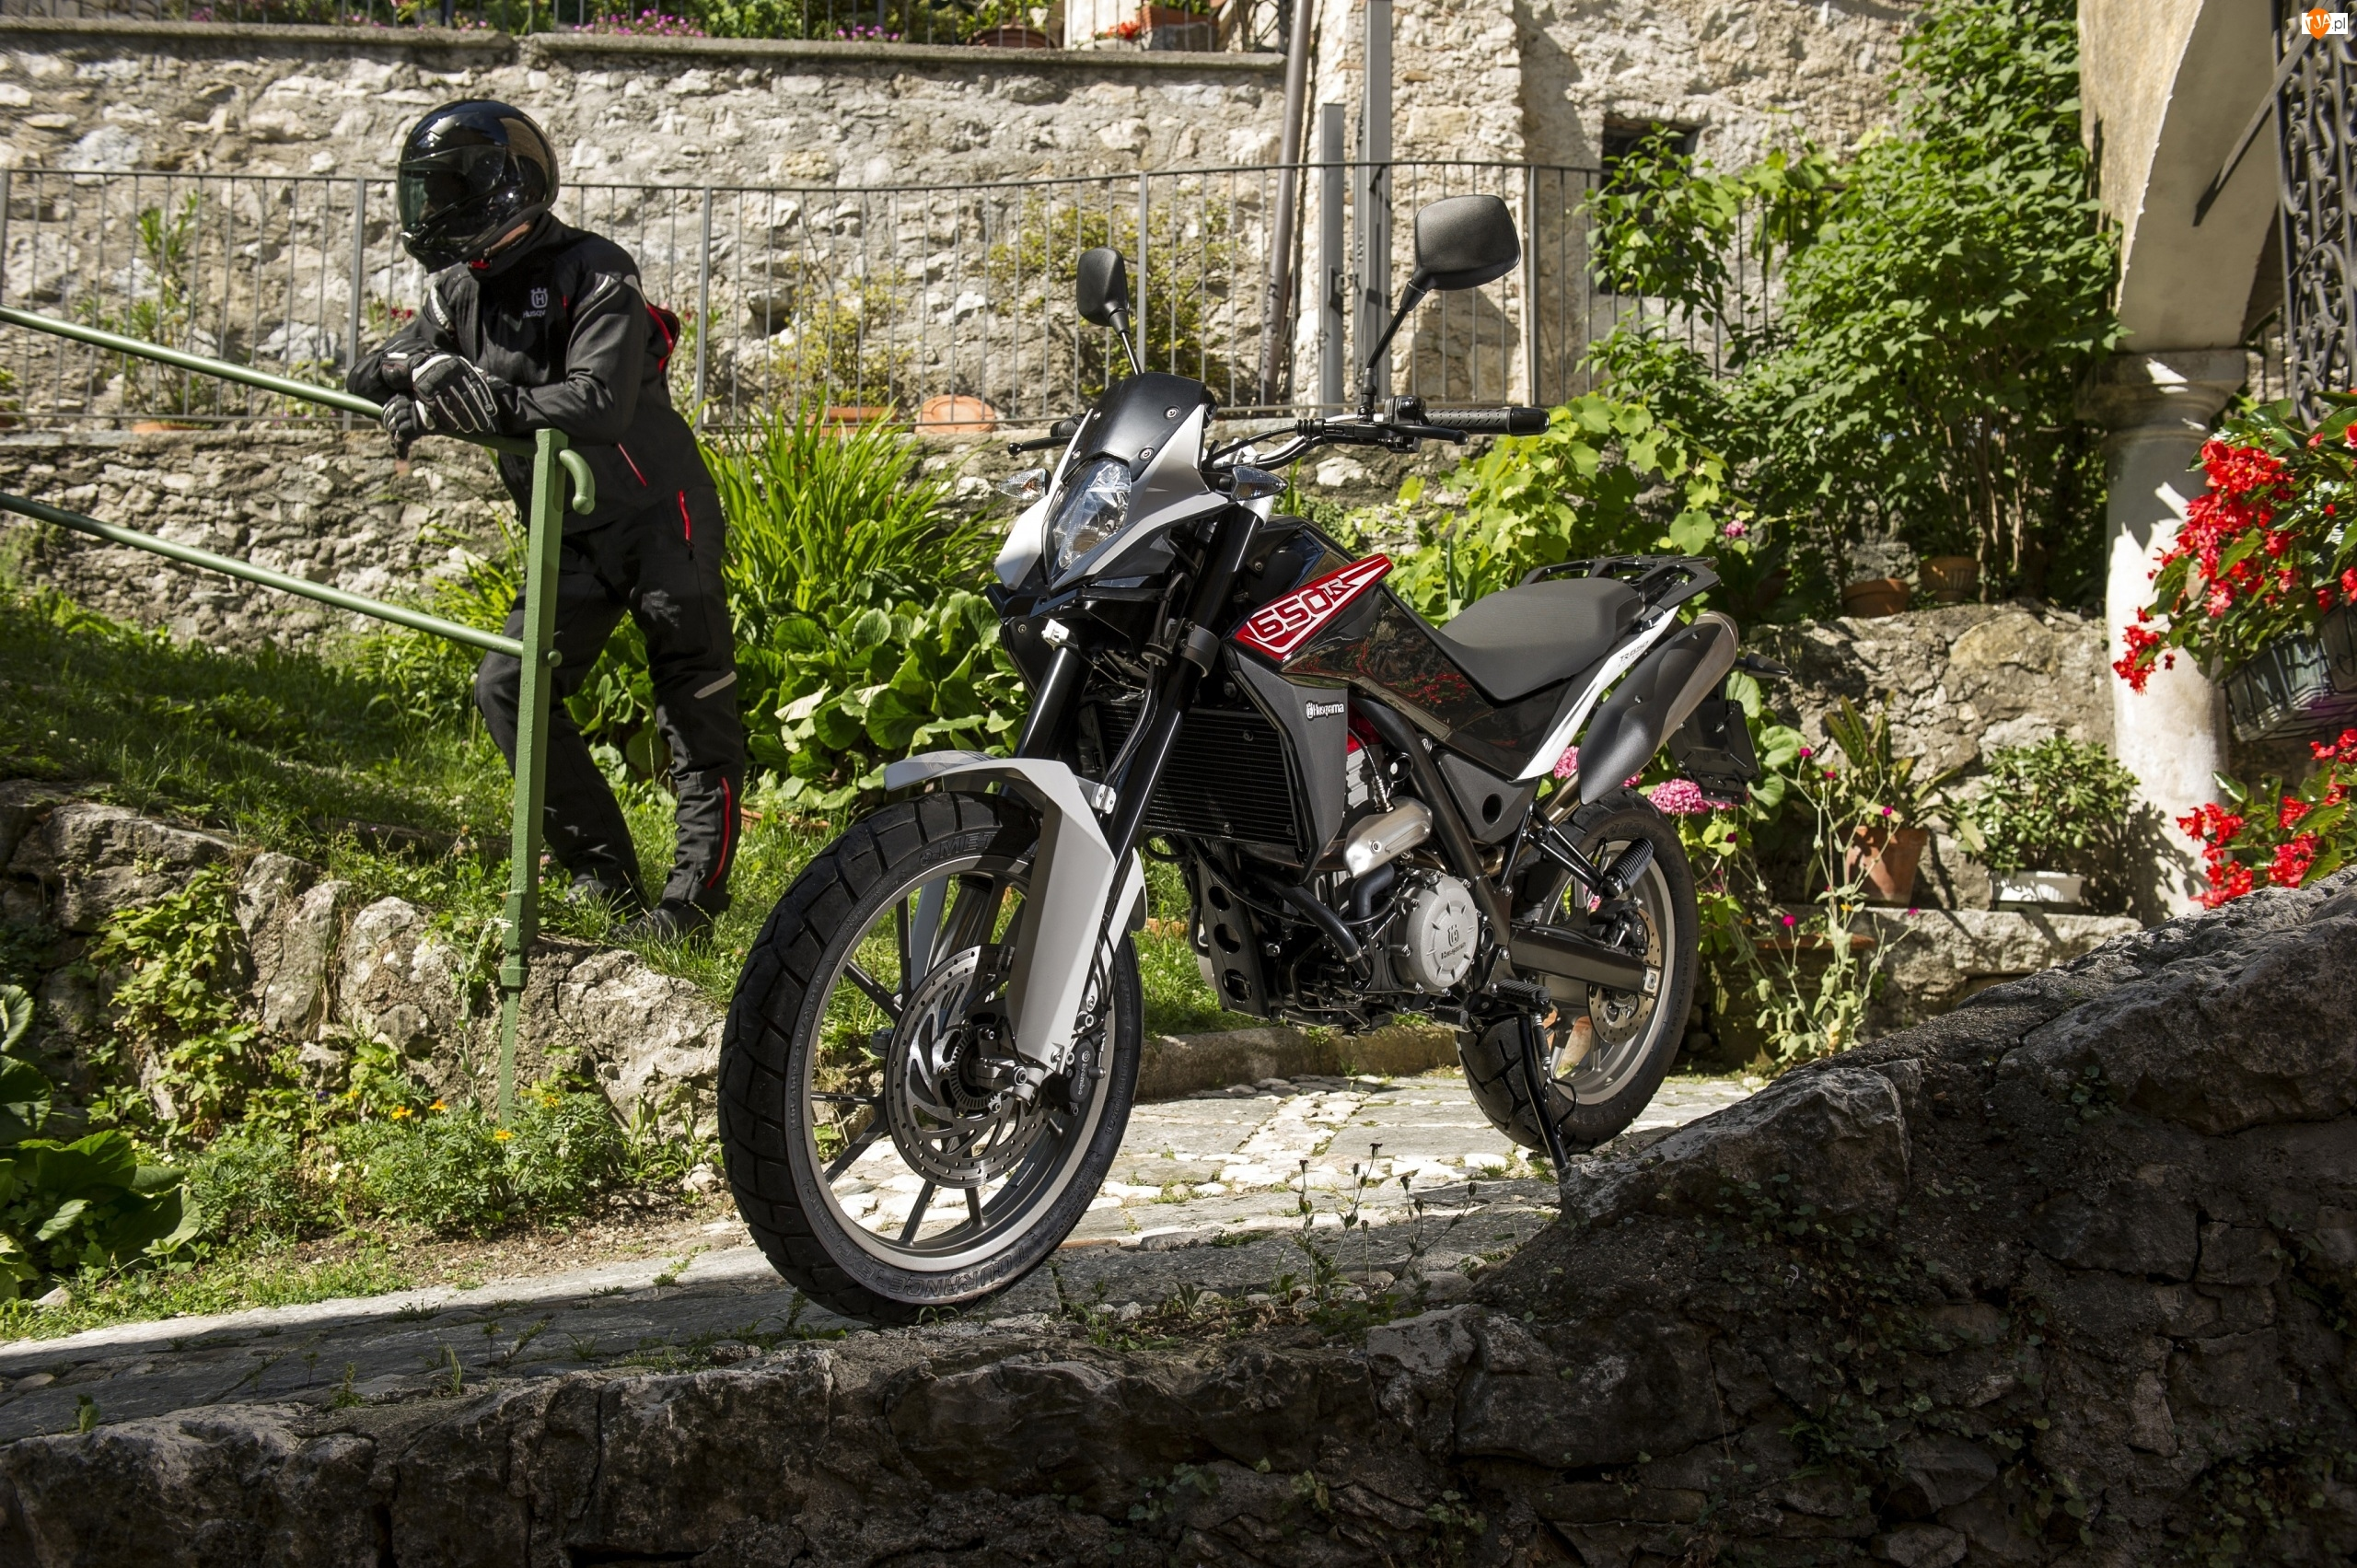 Motocyklista, Motocykl, Husqvarna TR 650 Strada